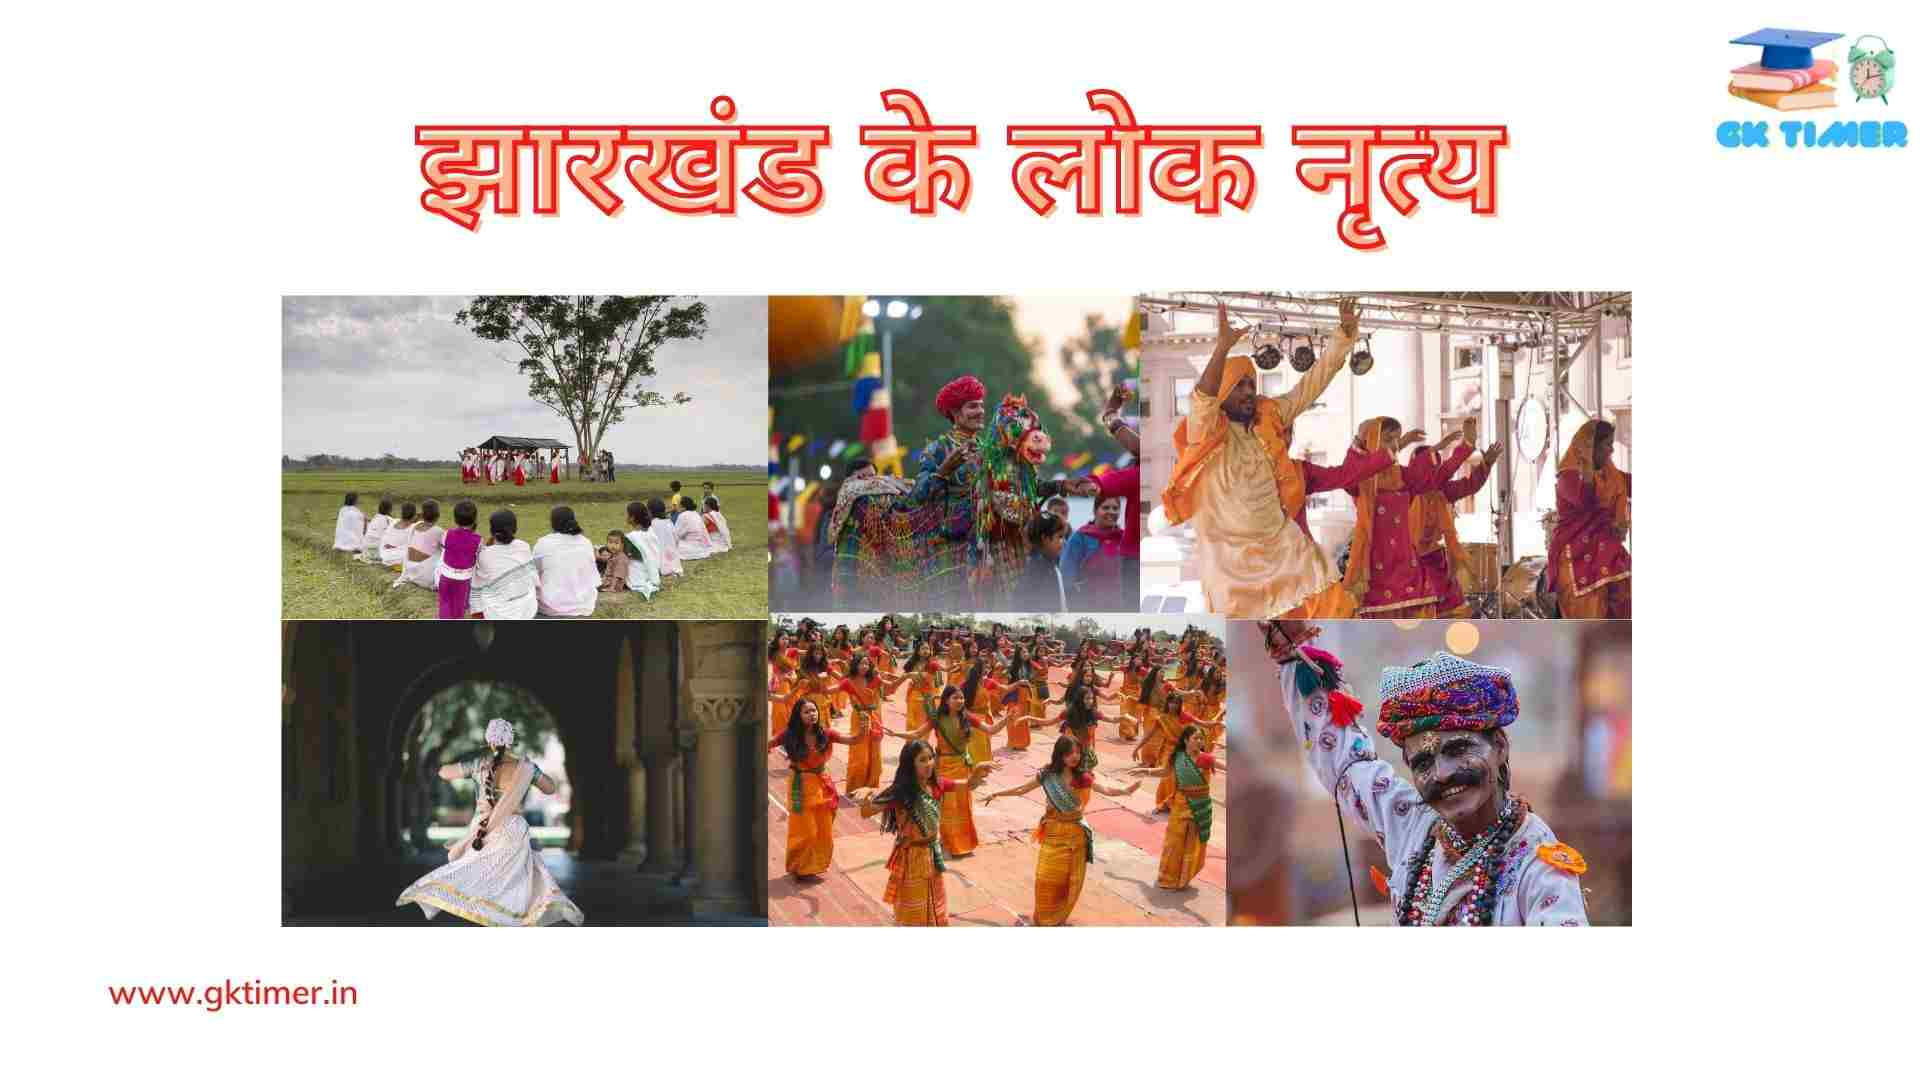 झारखंड के  लोकप्रिय लोक नृत्य(झुमर नृत्य, पाइका नृत्य, छऊ लोक नृत्य, फागुआ नृत्य) | Popular folk dances of Jharkhand in Hindi